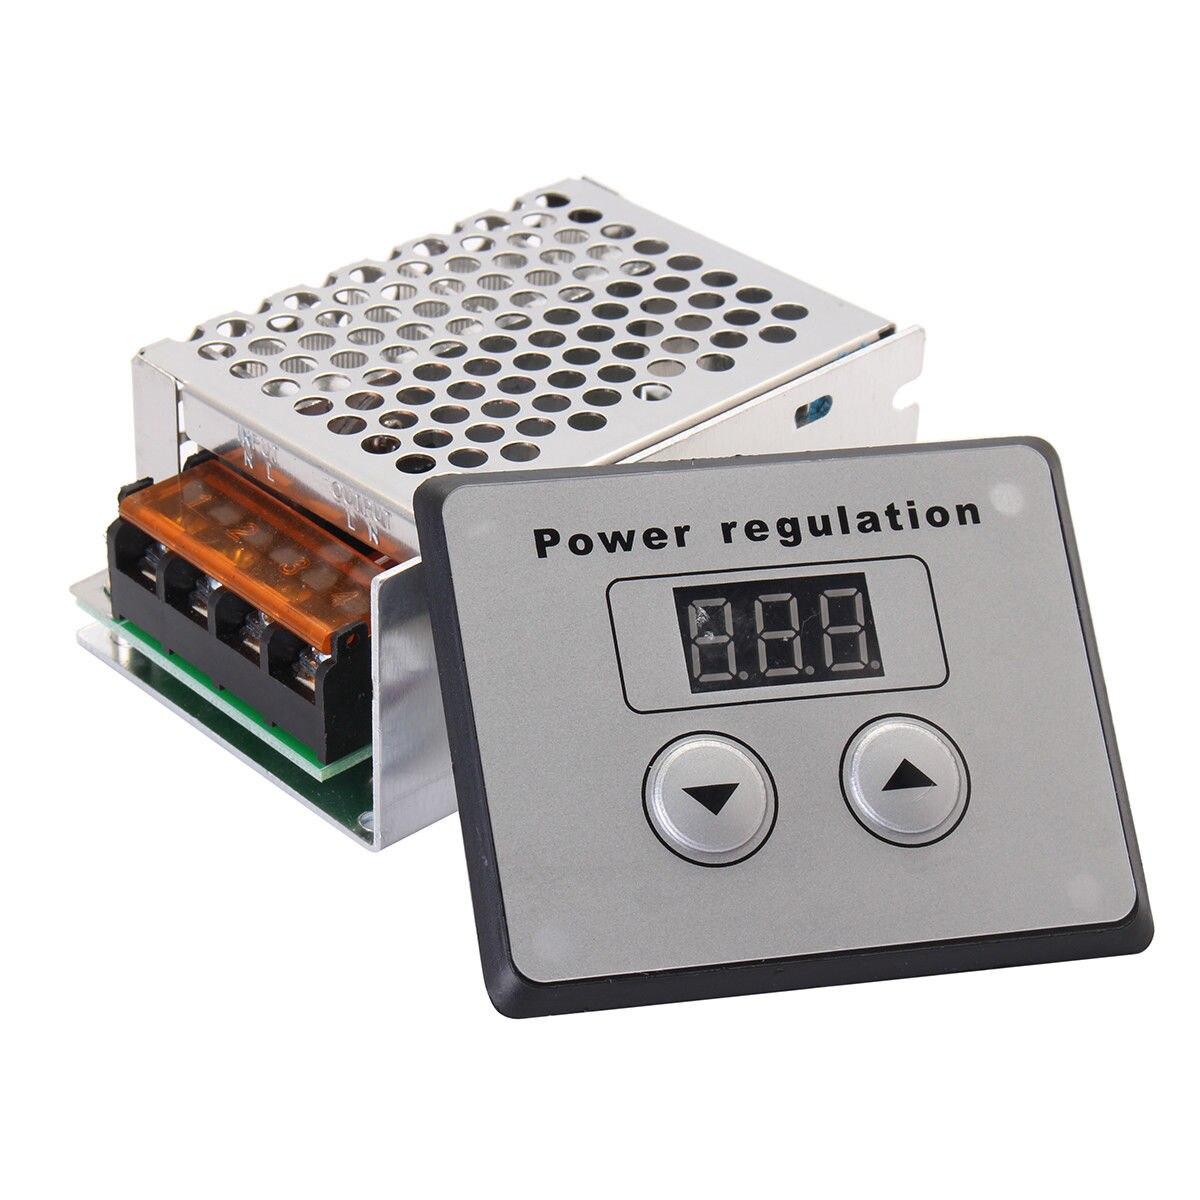 купить AC SCR Voltage Power Regulator Dimmer 4000W 220V Electric Motor Speed Temperature Controller For Electric Furnace Water Heater недорого